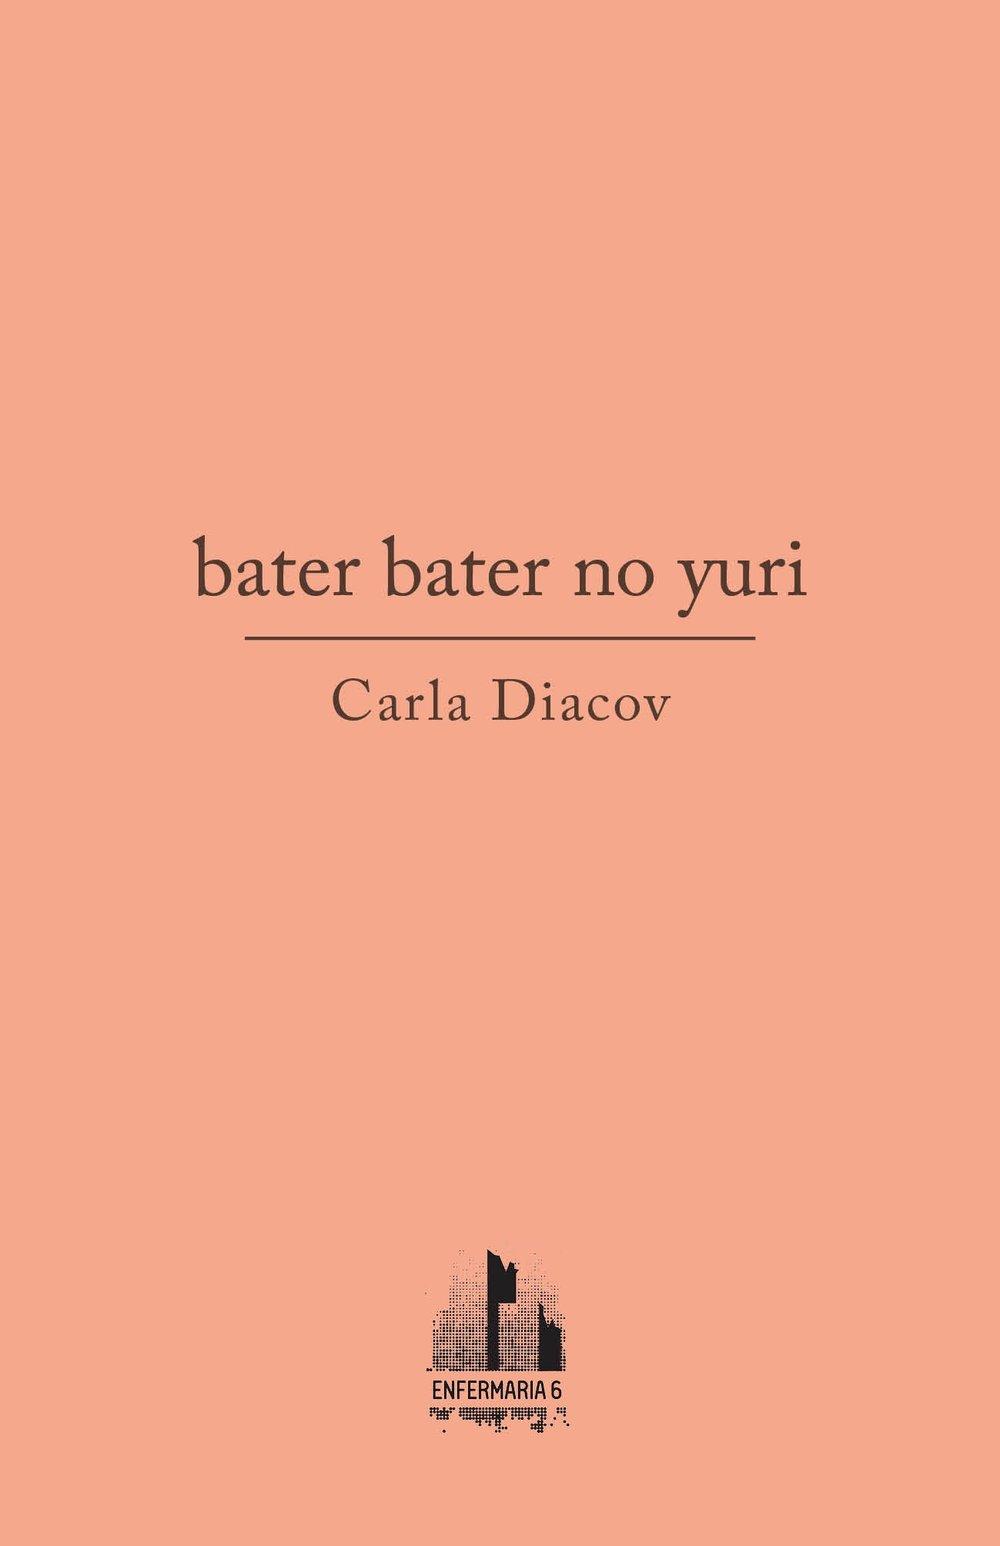 Carla Diacov, bater bater no yuri